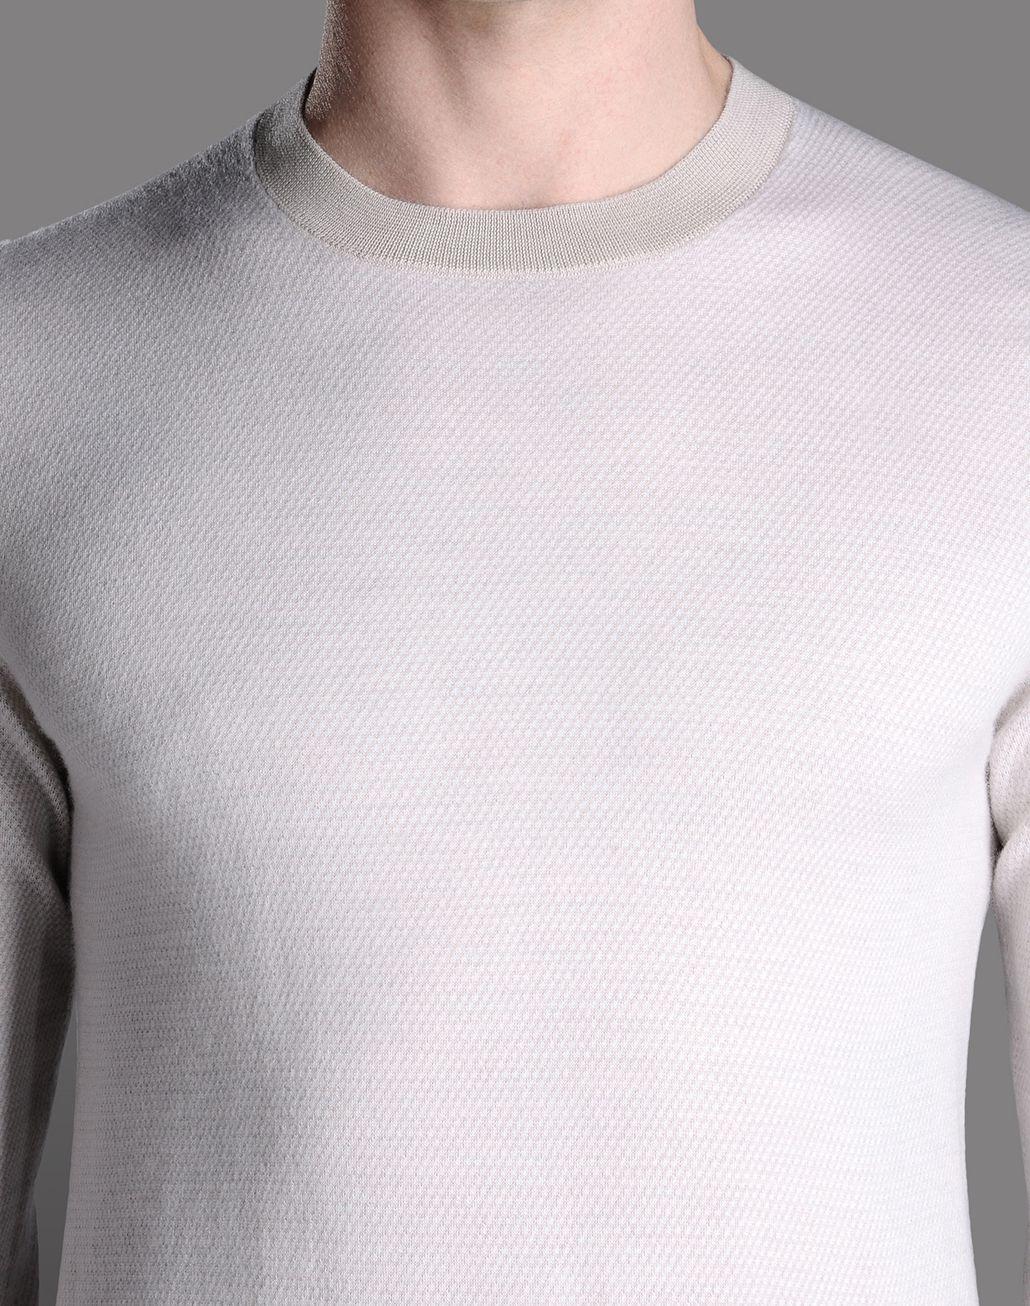 BRIONI CREW-NECK JERSEY  Knitwear U e